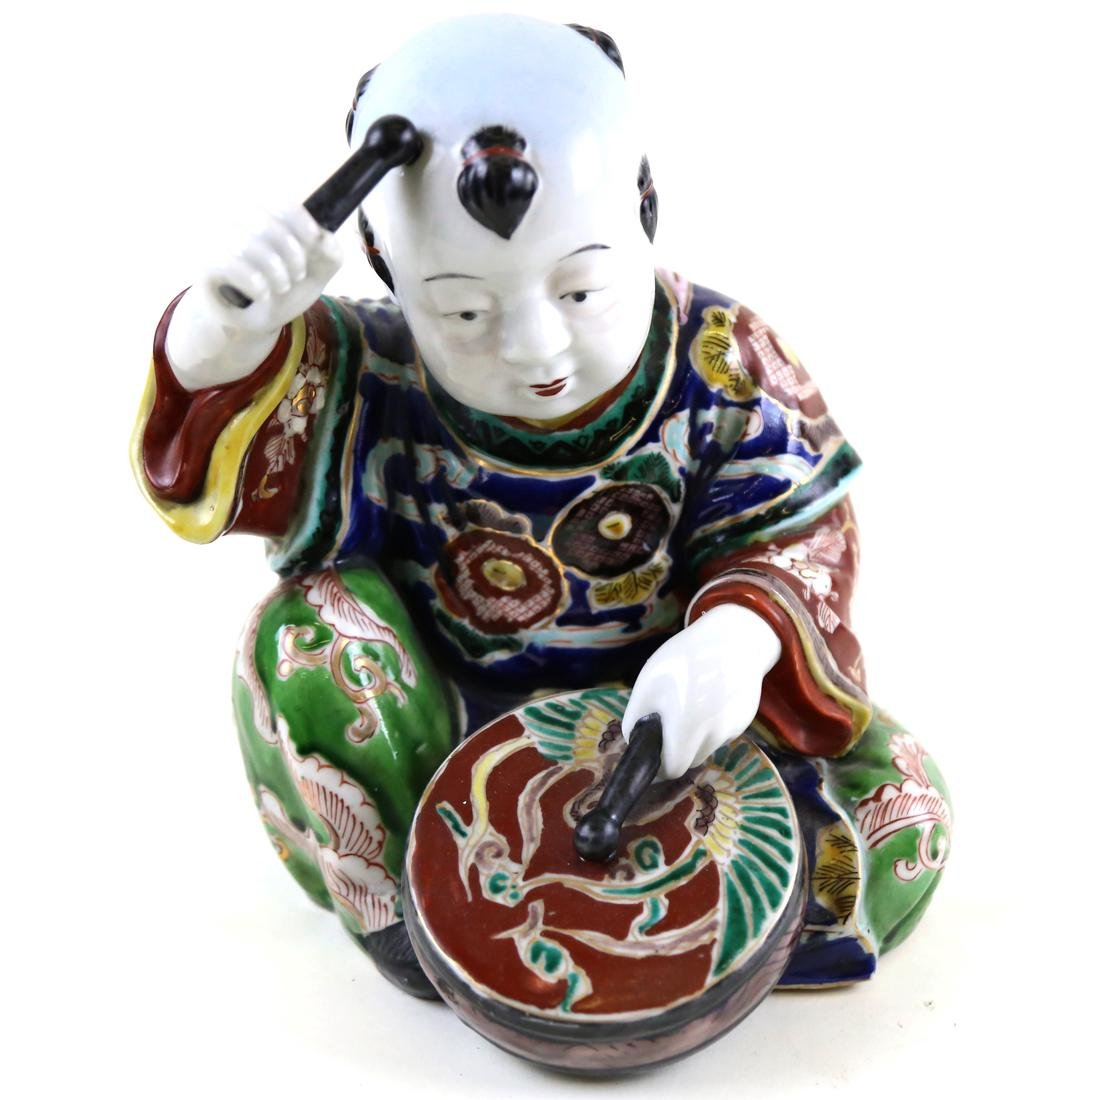 Modern Chinese Sculpture, Boy With Drum